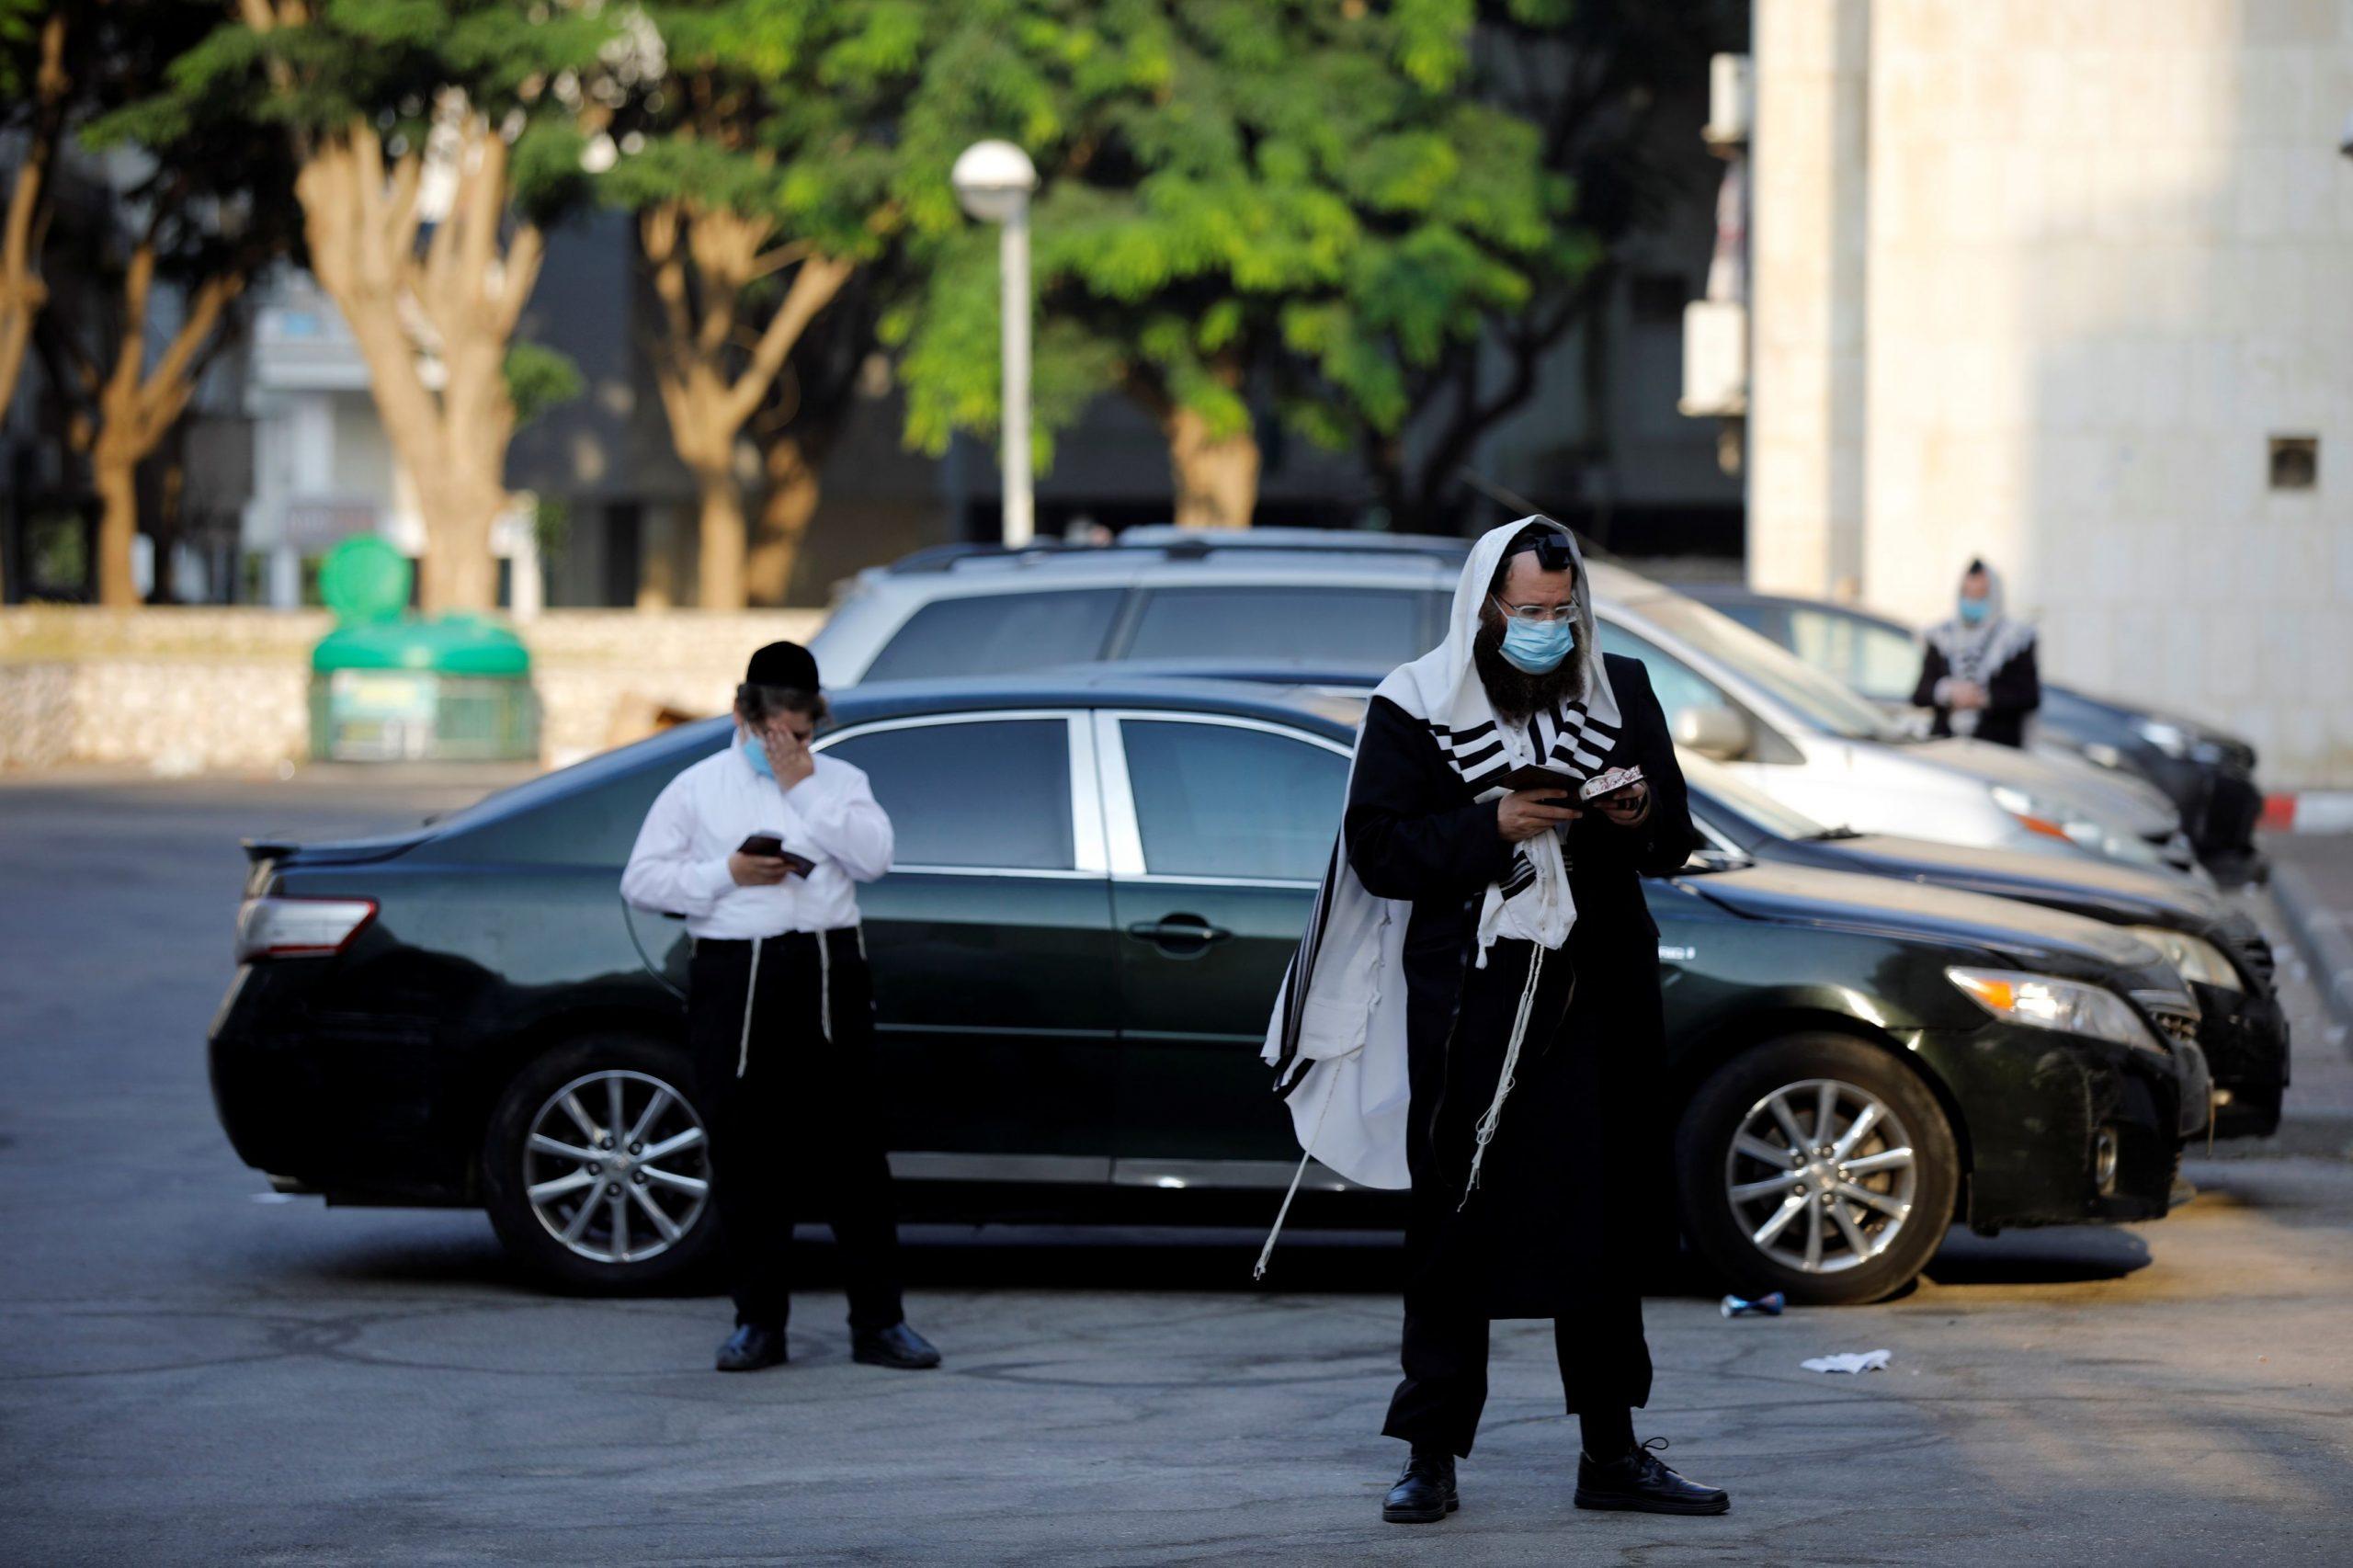 foto: REUTERS/Amir Cohen